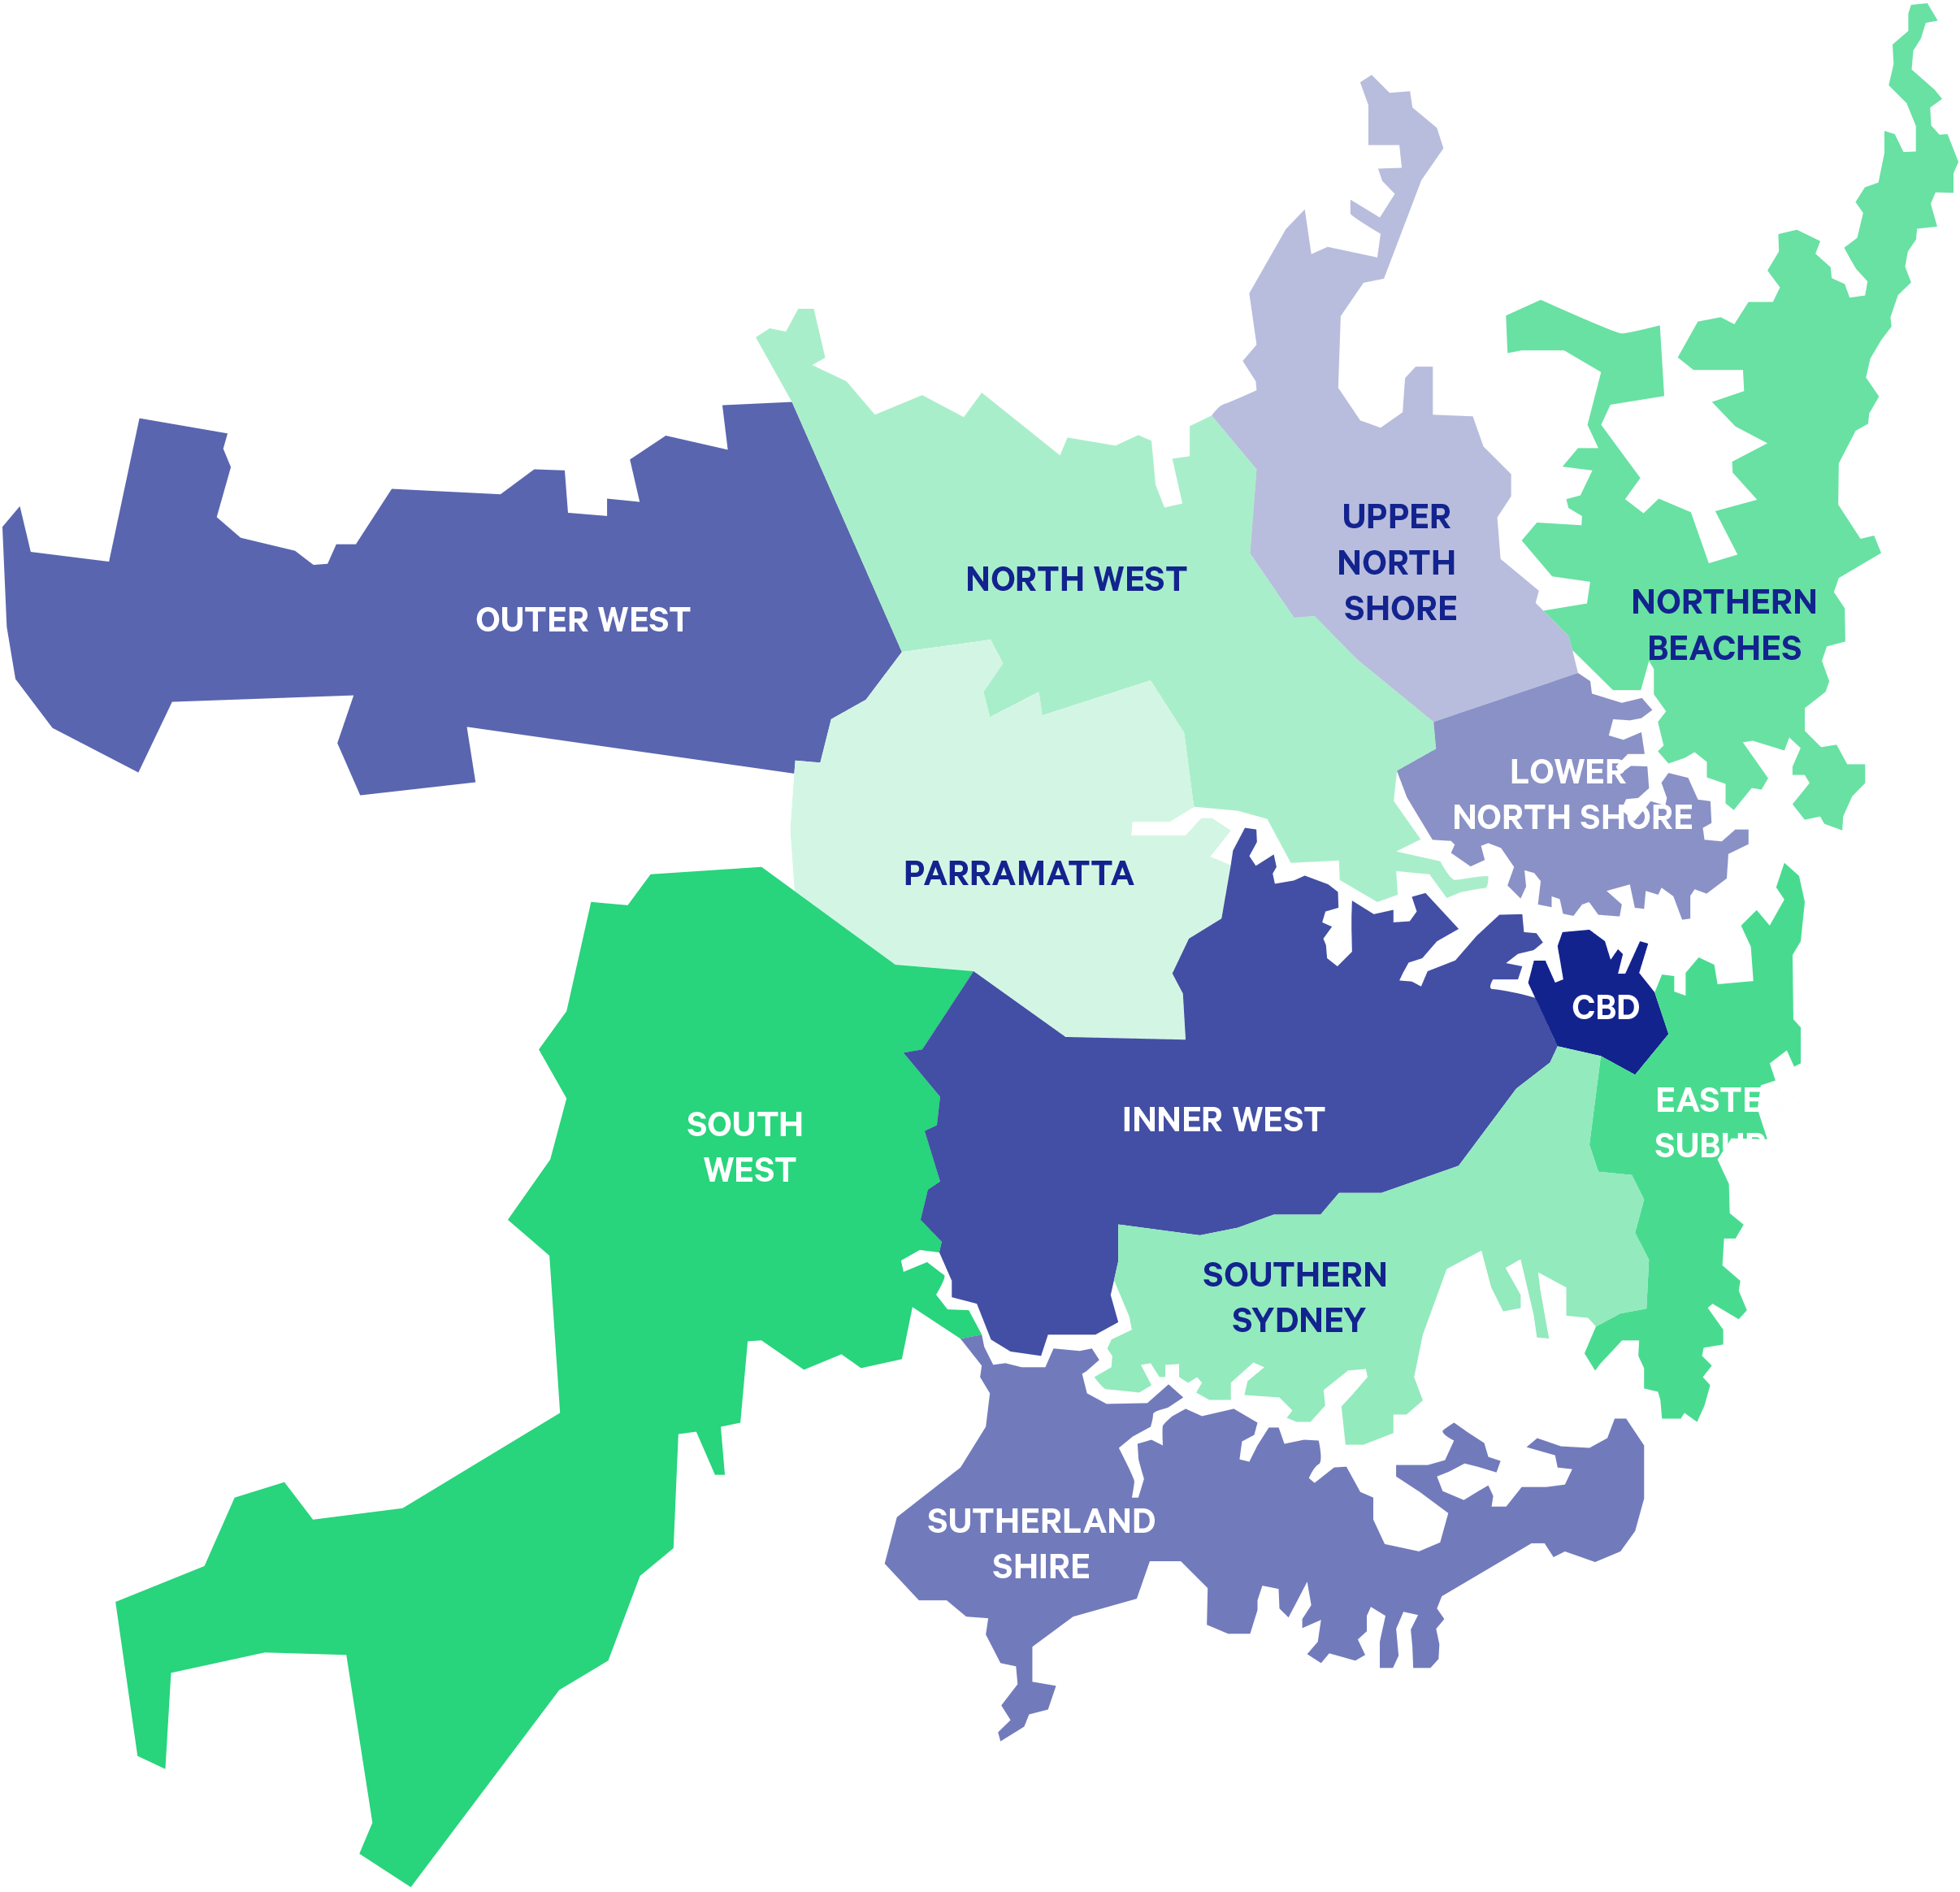 Sydney Suburbs Map Sydney Suburbs Map   Skip Hire Sydney